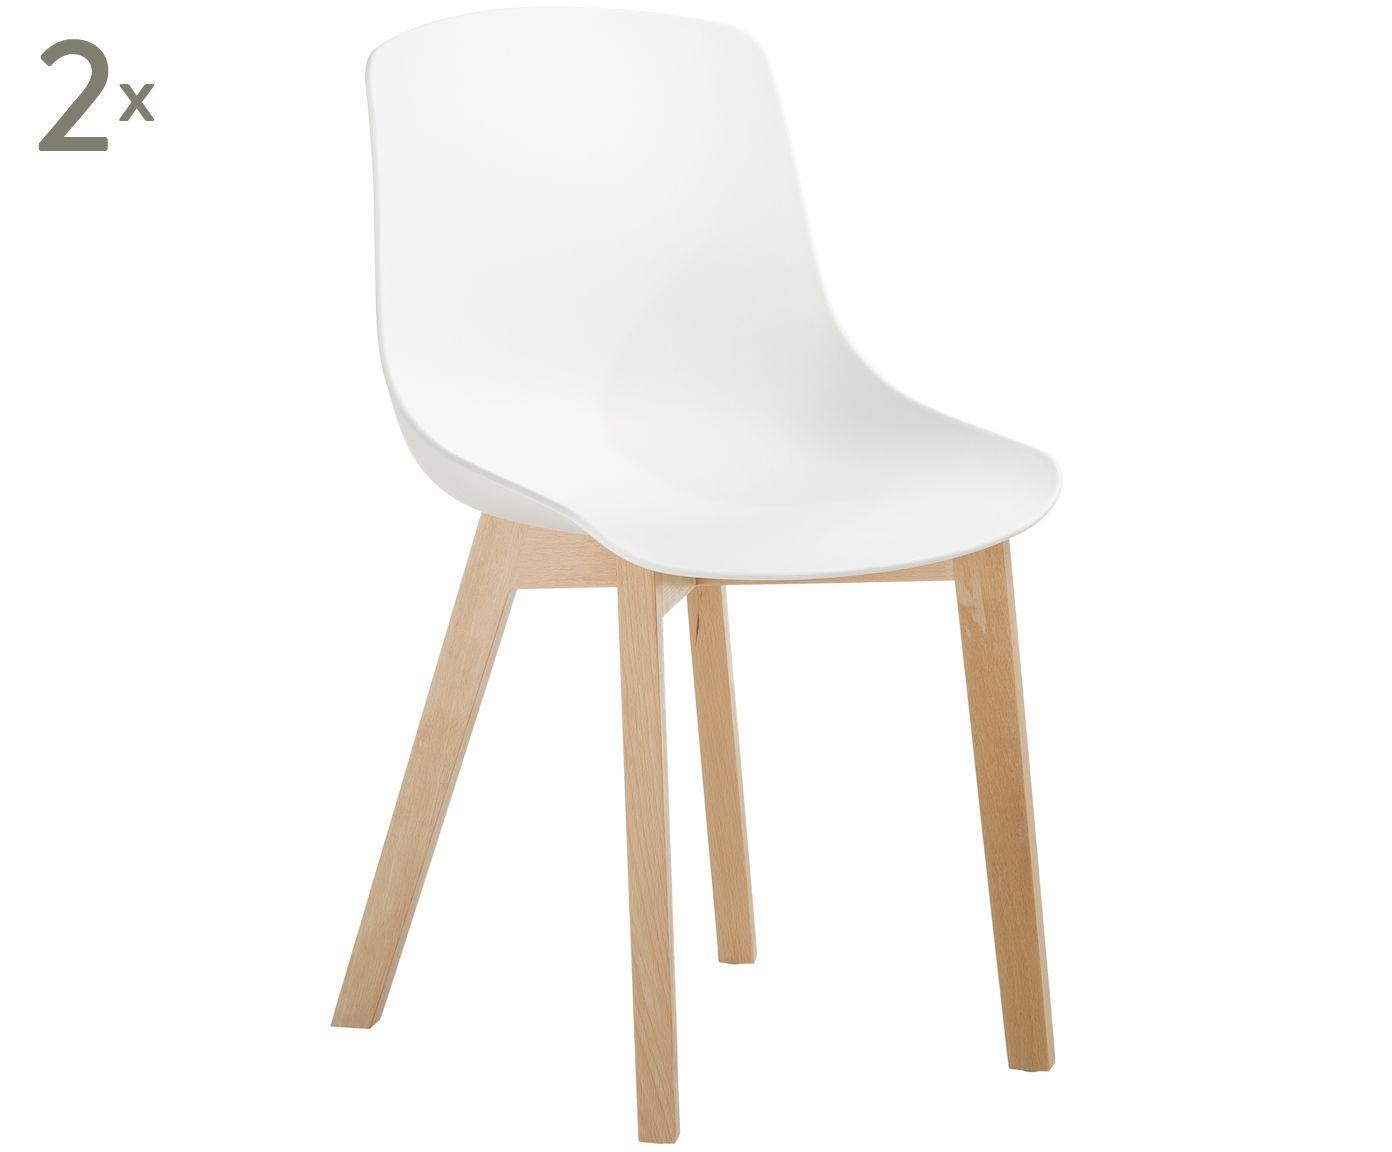 Kunststoffstuhle Dave Mit Holzbeinen 2 Stuck Westwingnow Kunststoffstuhle Stuhle Stuhl Kunststoff